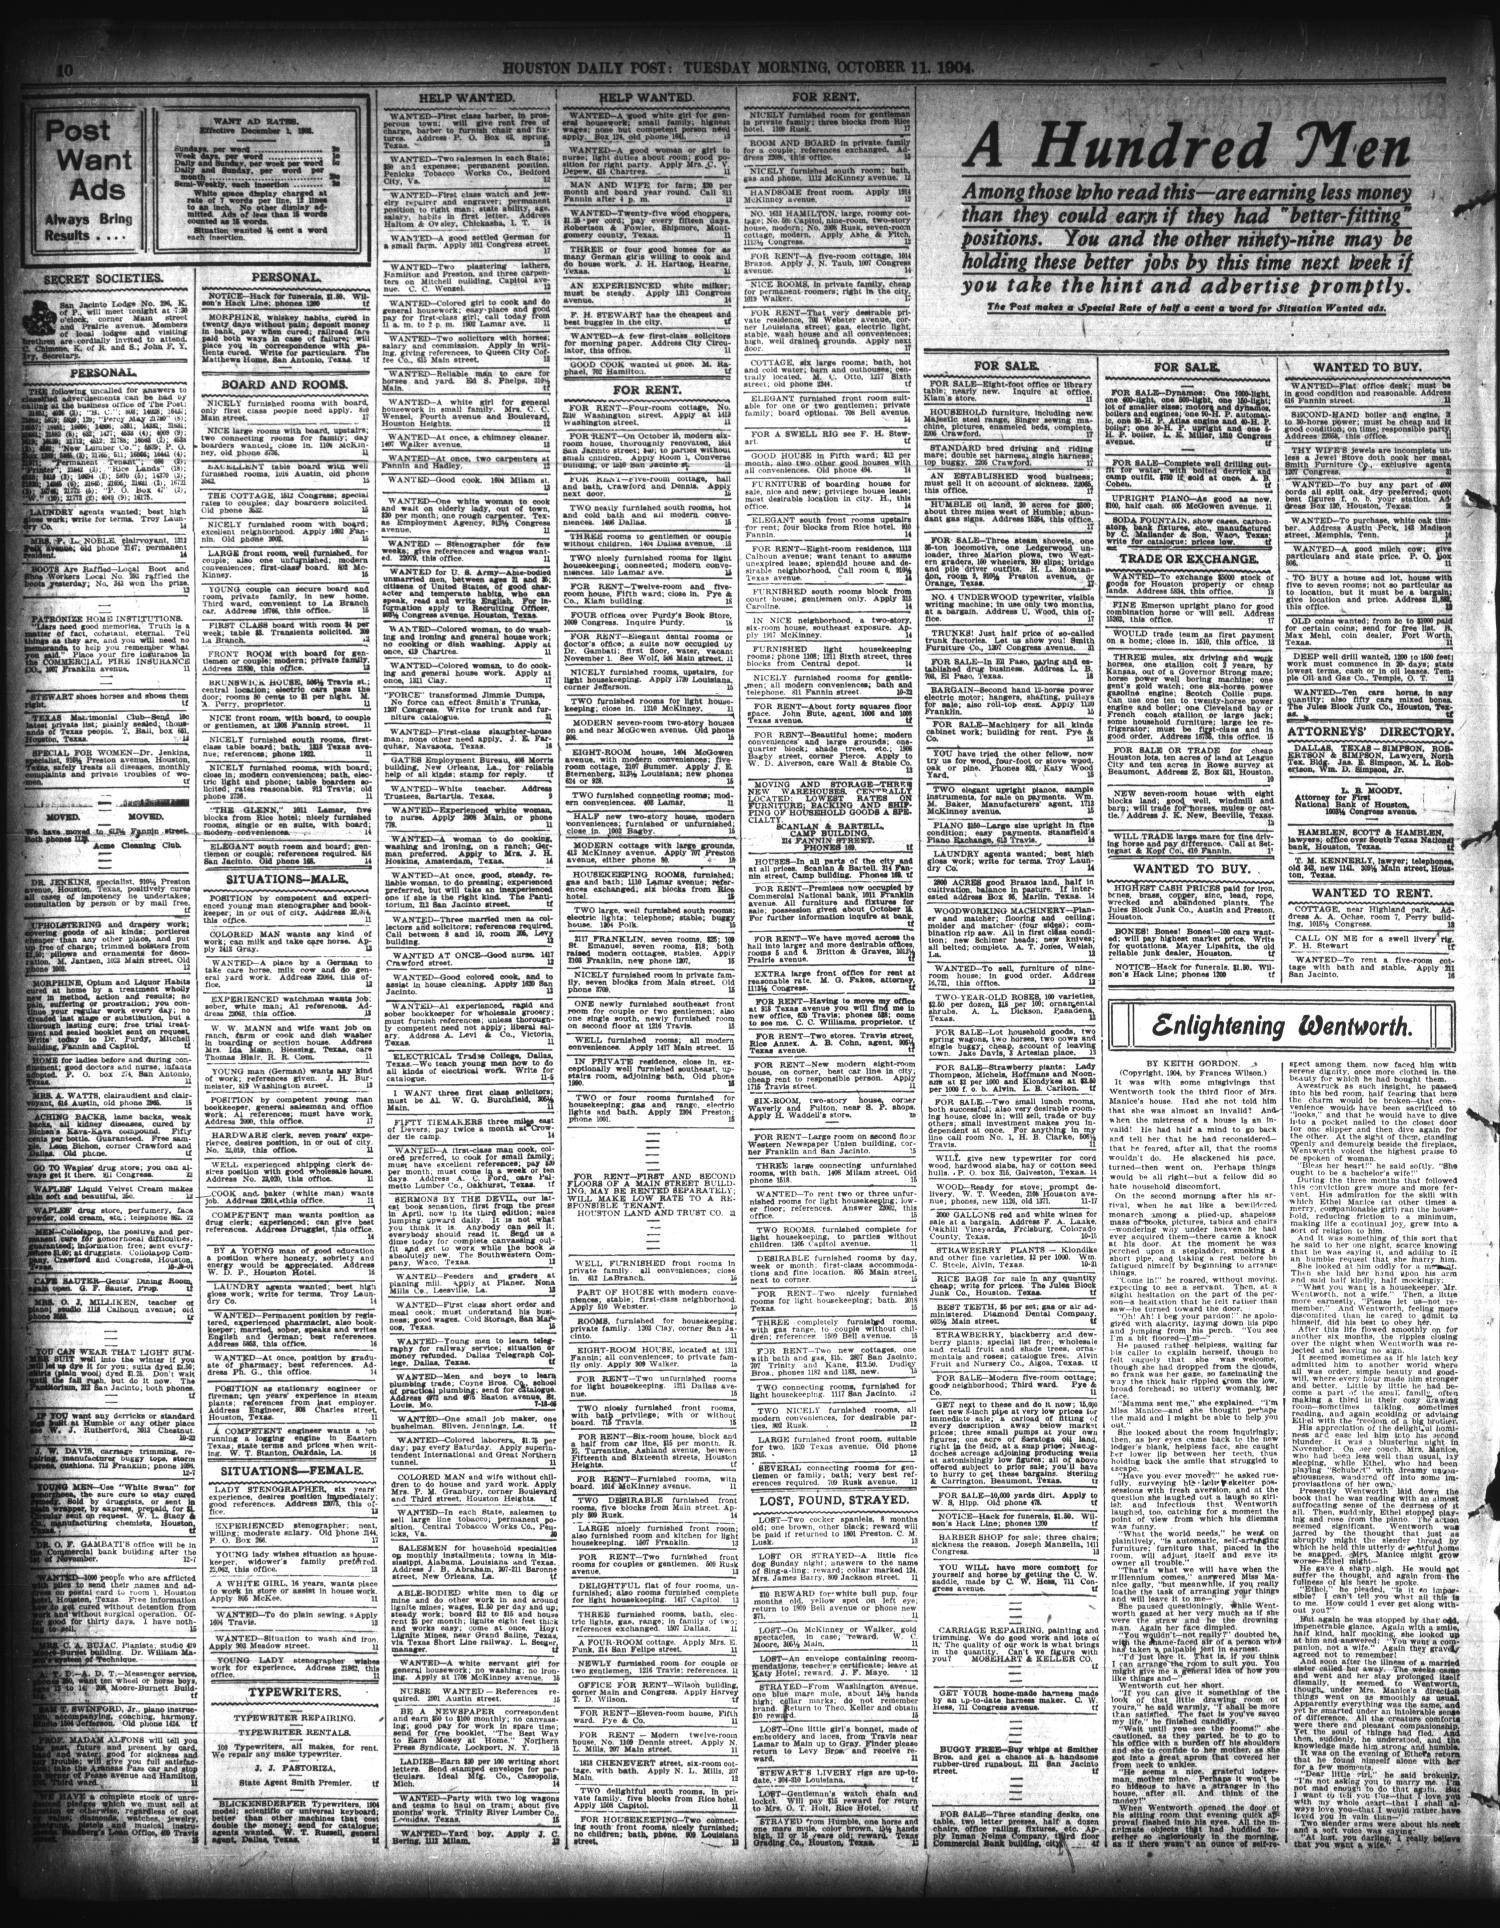 ab9abb4e7 The Houston Post. (Houston, Tex.), Vol. 20, No. 210, Ed. 1 Tuesday, October  11, 1904 - Page 10 of 12 - The Portal to Texas History